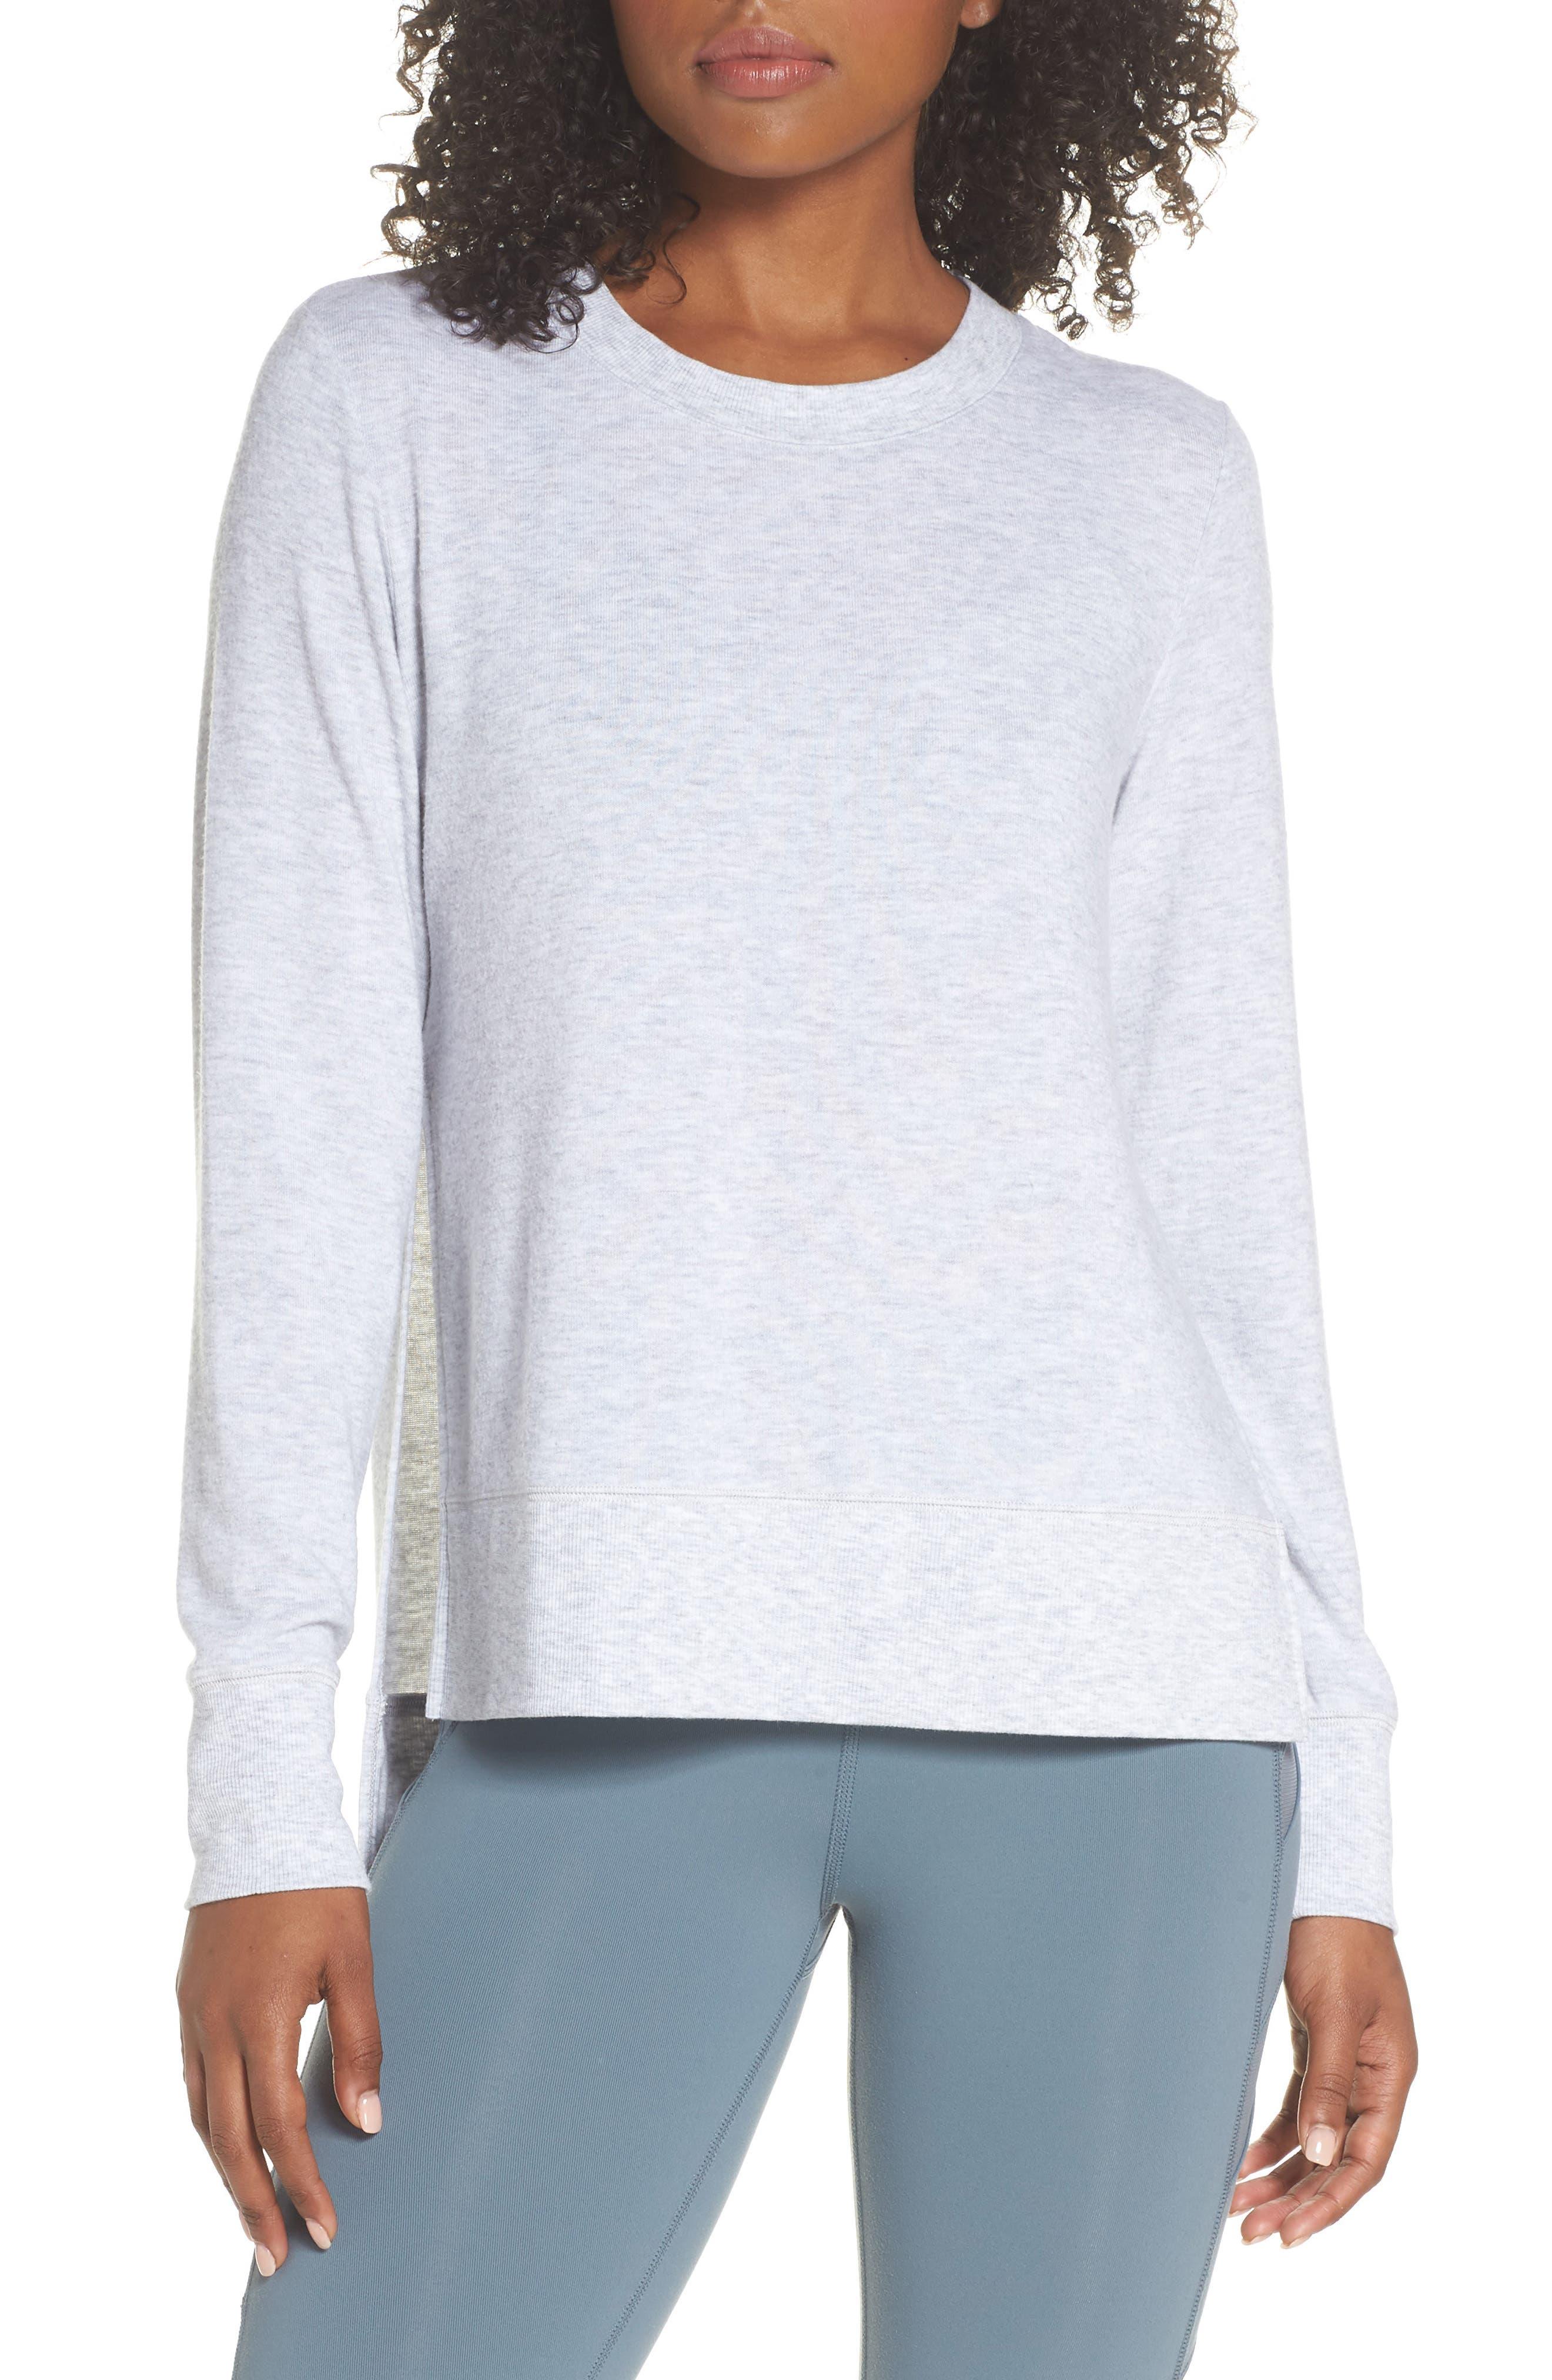 'Glimpse' Long Sleeve Top,                         Main,                         color, Vapor Grey Heather